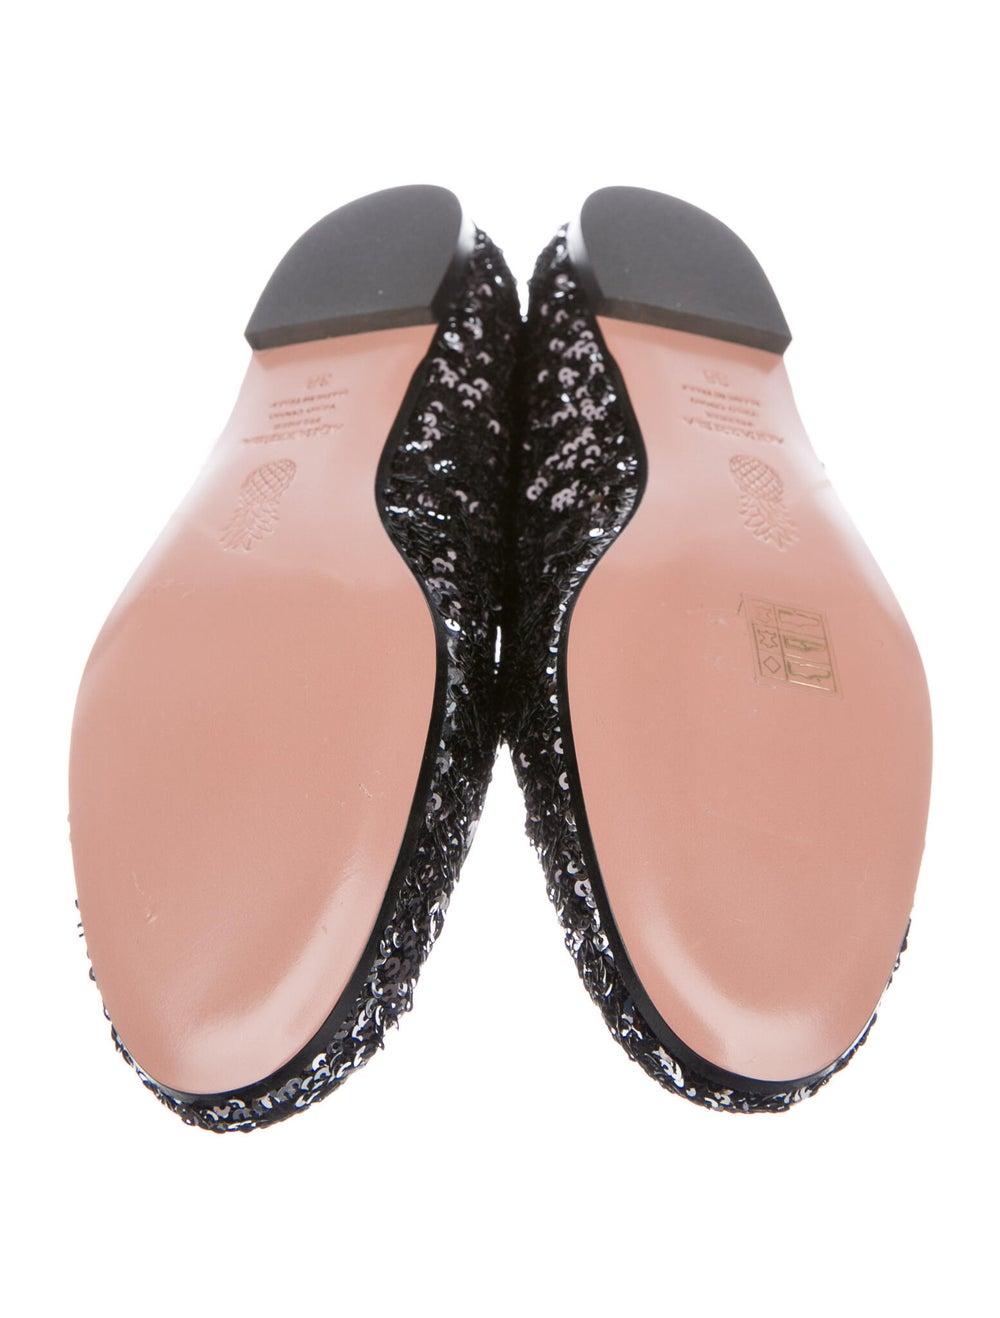 Aquazzura Loafers Black - image 5